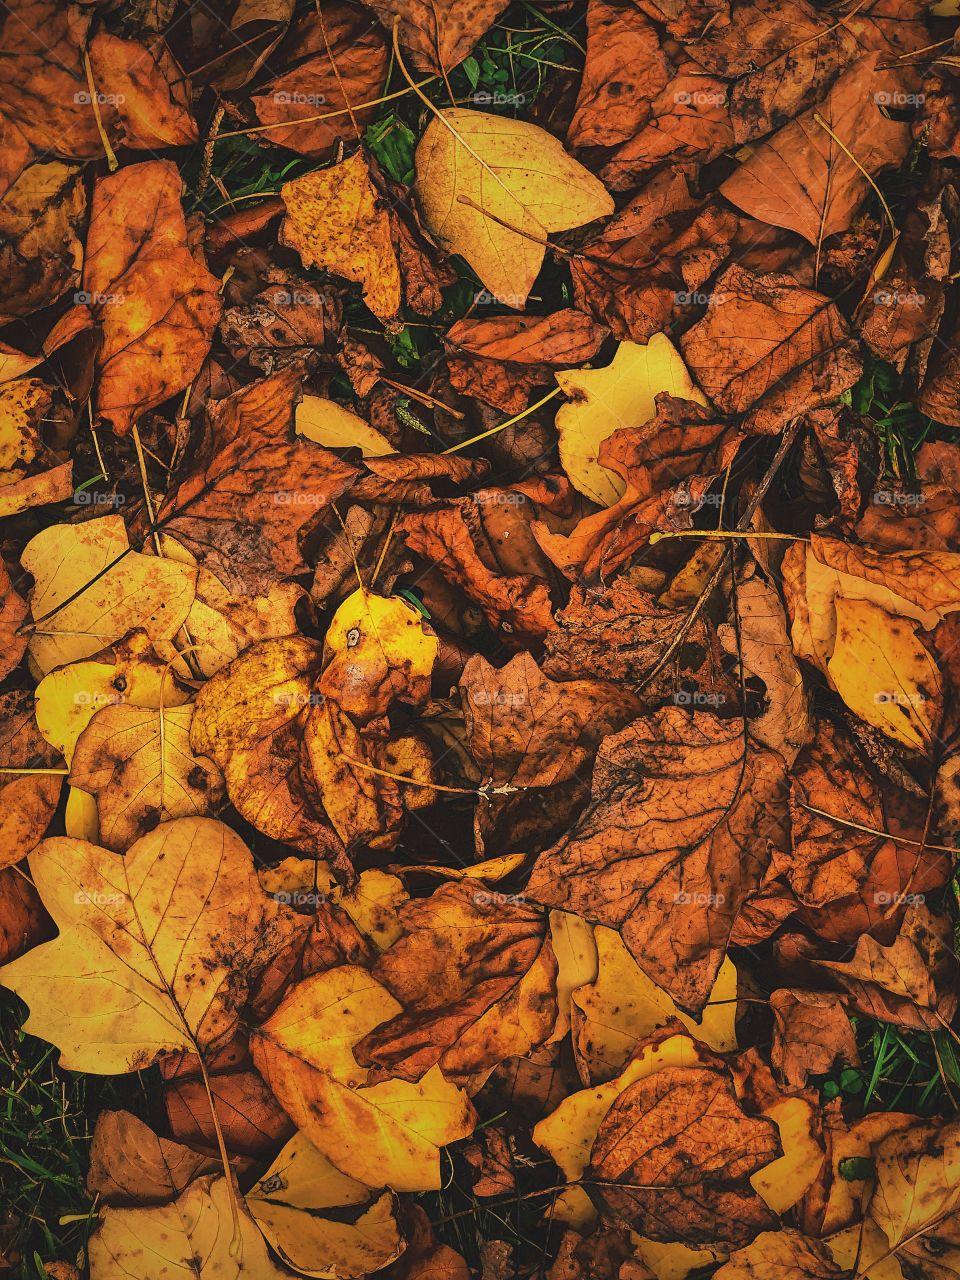 Fallen Leaves On The Ground, Fallen Leaves In The Forest, Colorful Leaves On The Ground, Details In The Leaves, Autumn Leaves In The Woods